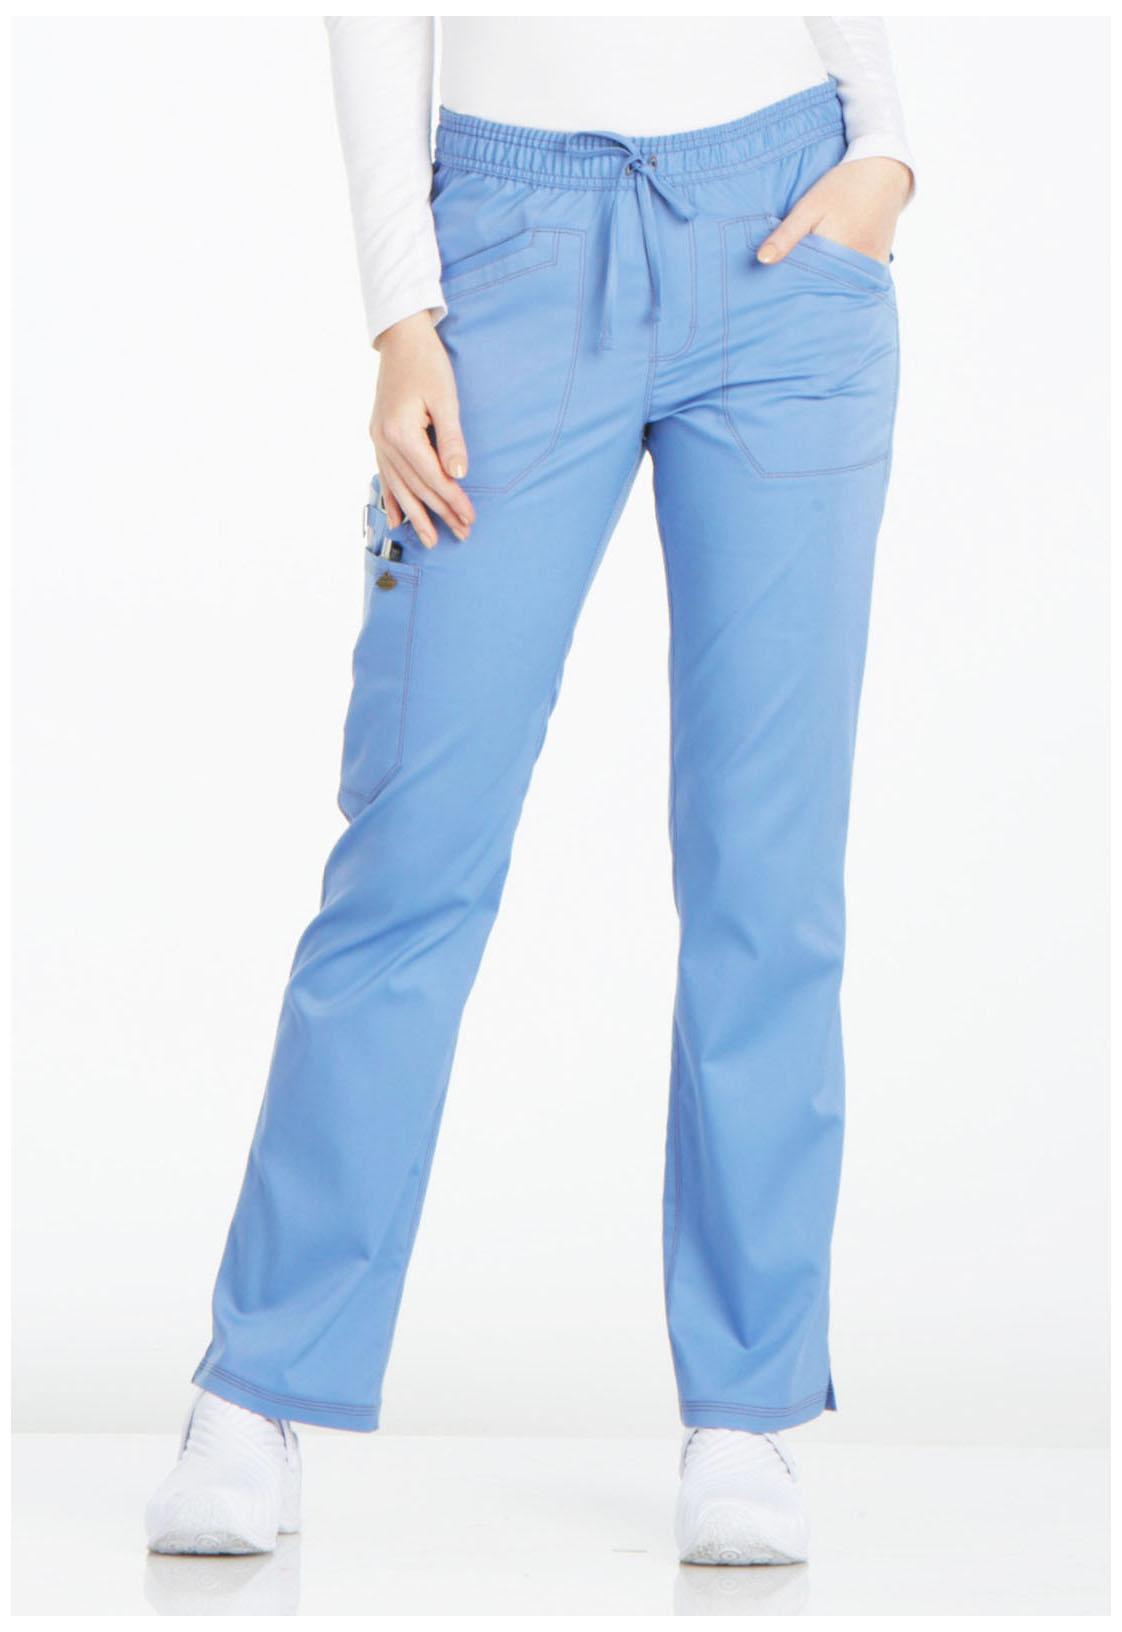 f042eda5525 Essence Mid Rise Straight Leg Drawstring Pant in Ciel Blue DK106P ...